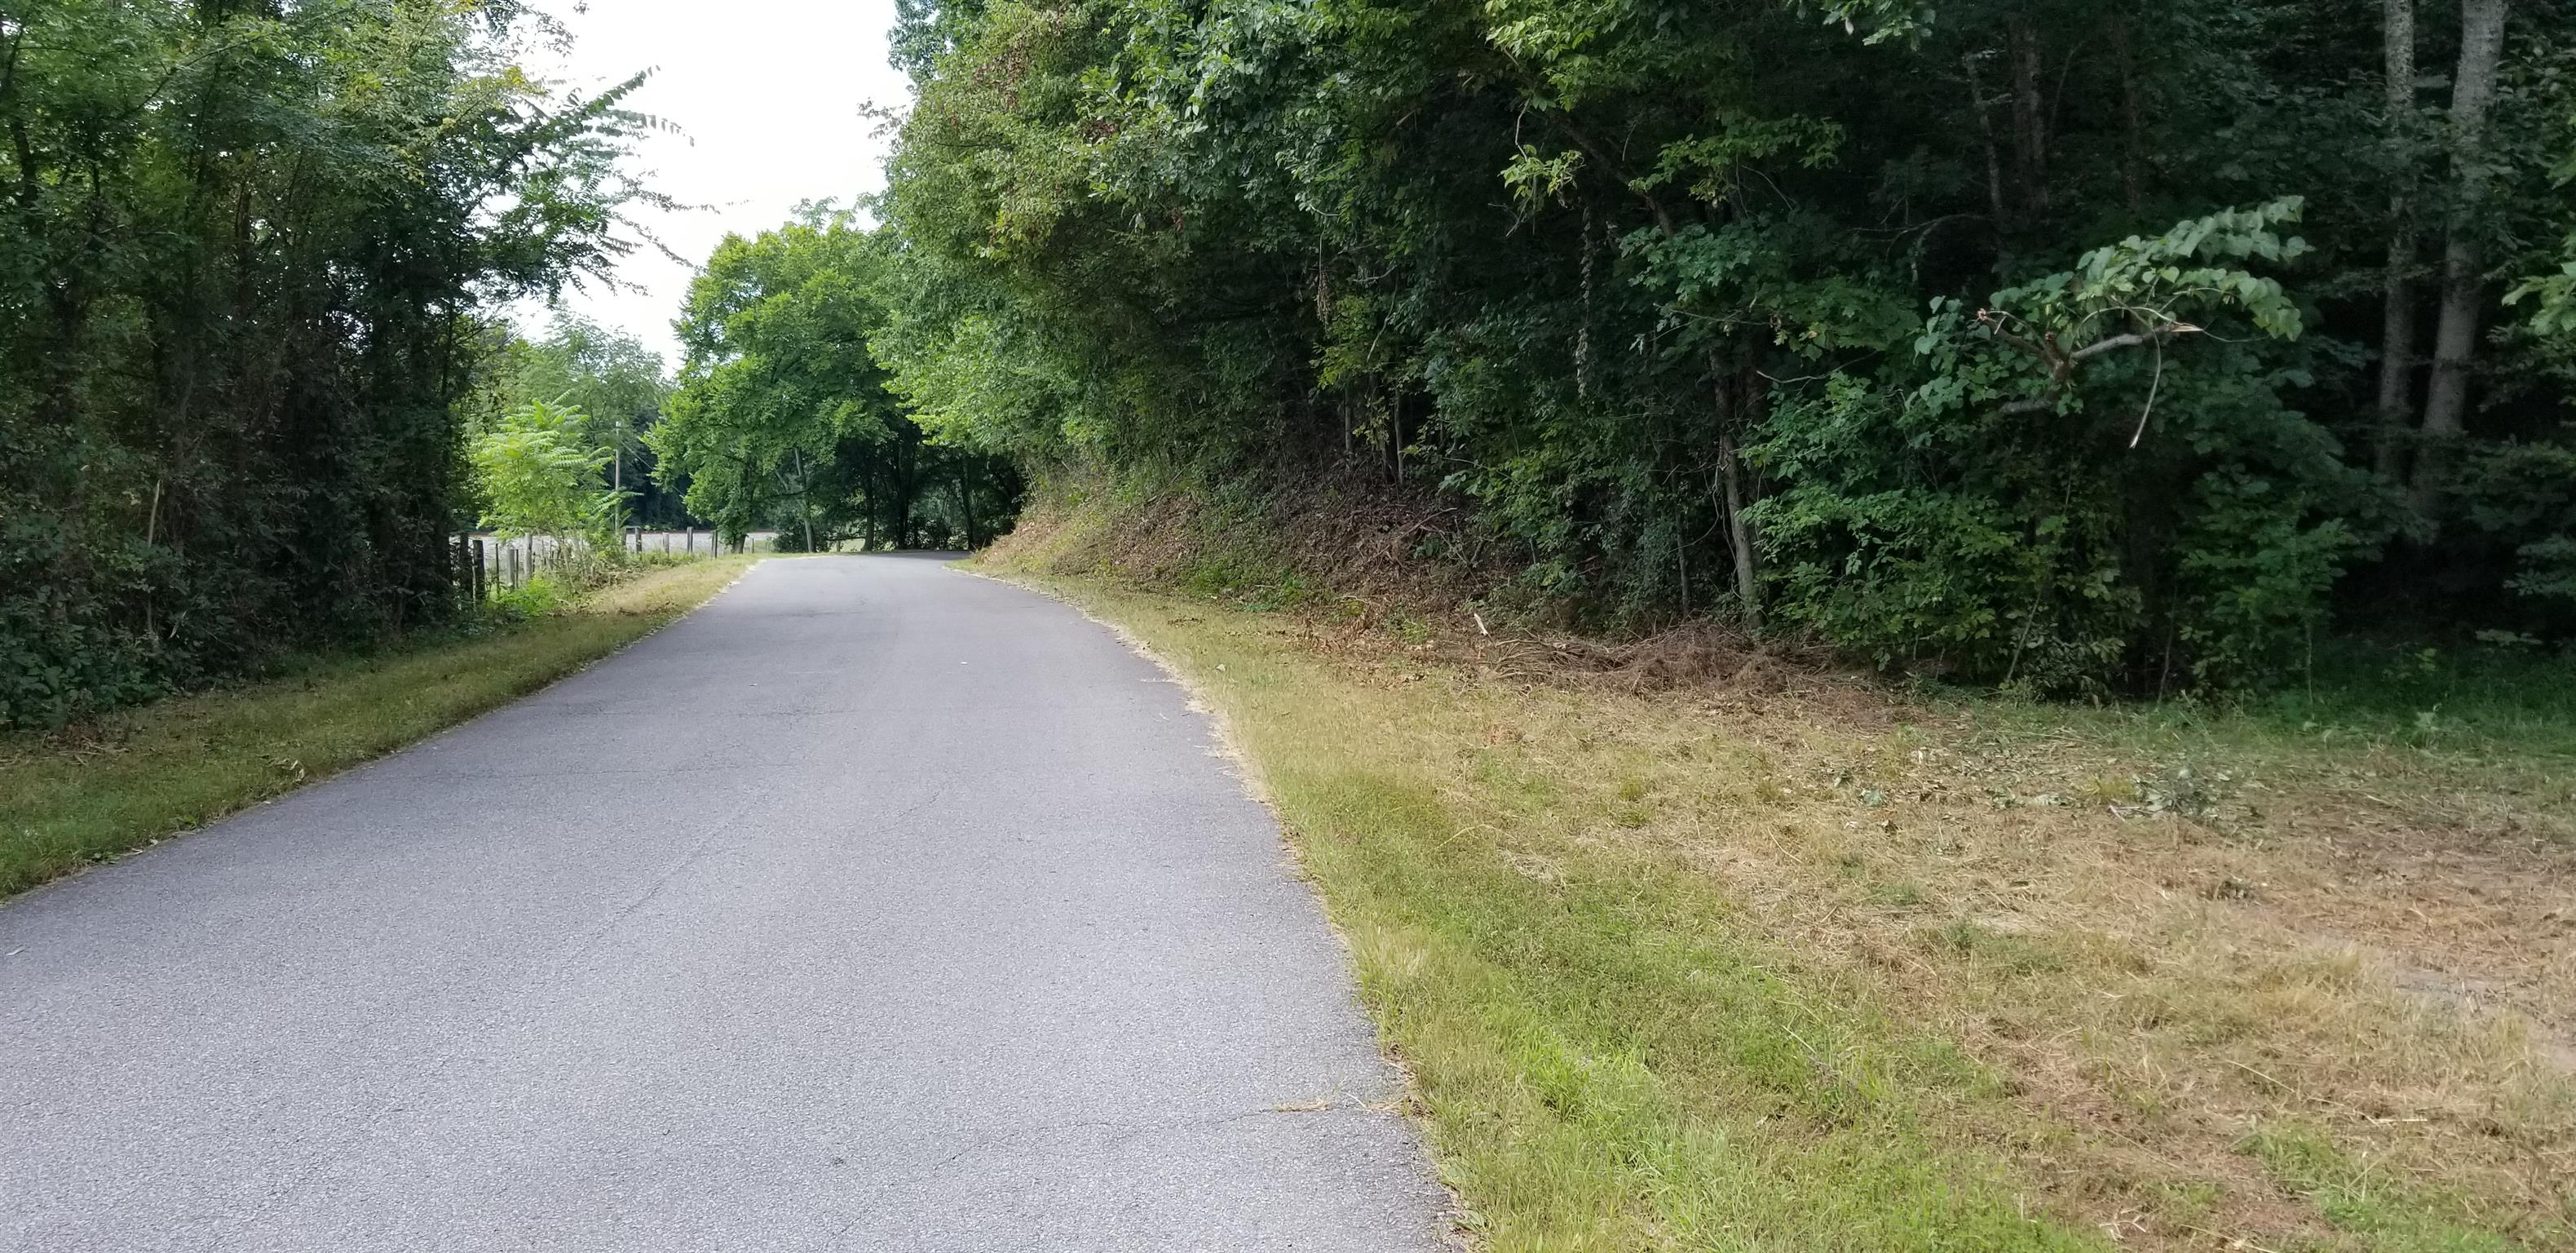 0 W Trace Creek Rd, Waverly, TN 37185 - Waverly, TN real estate listing